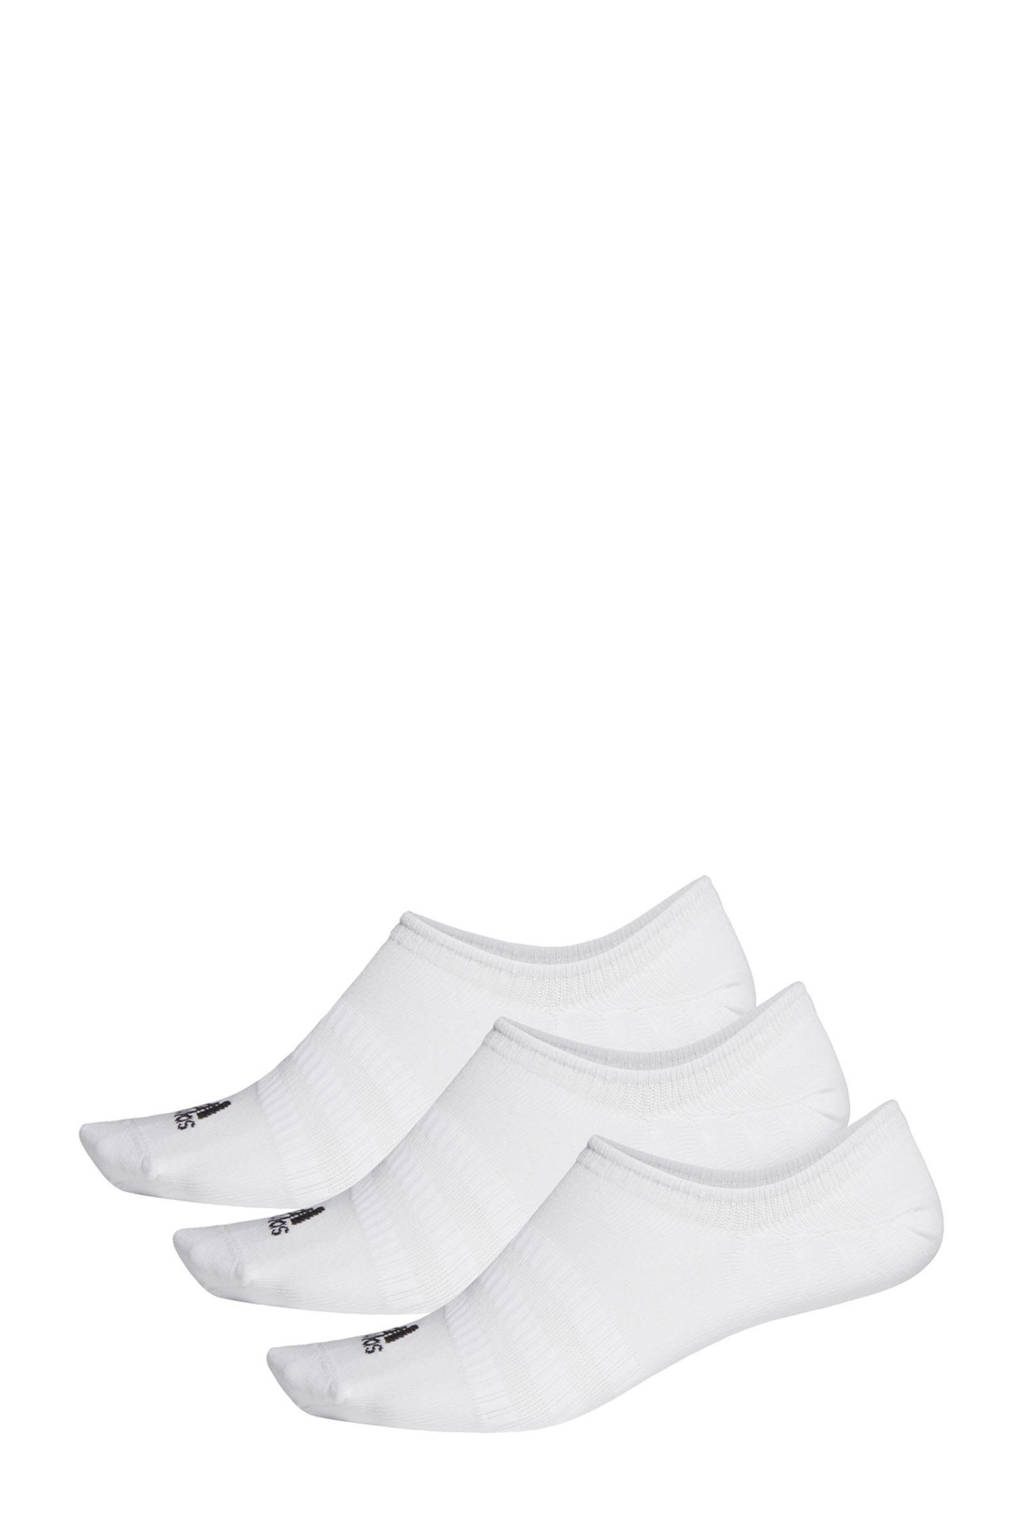 adidas Performance No Show sportsokken - set van 3 wit, Wit